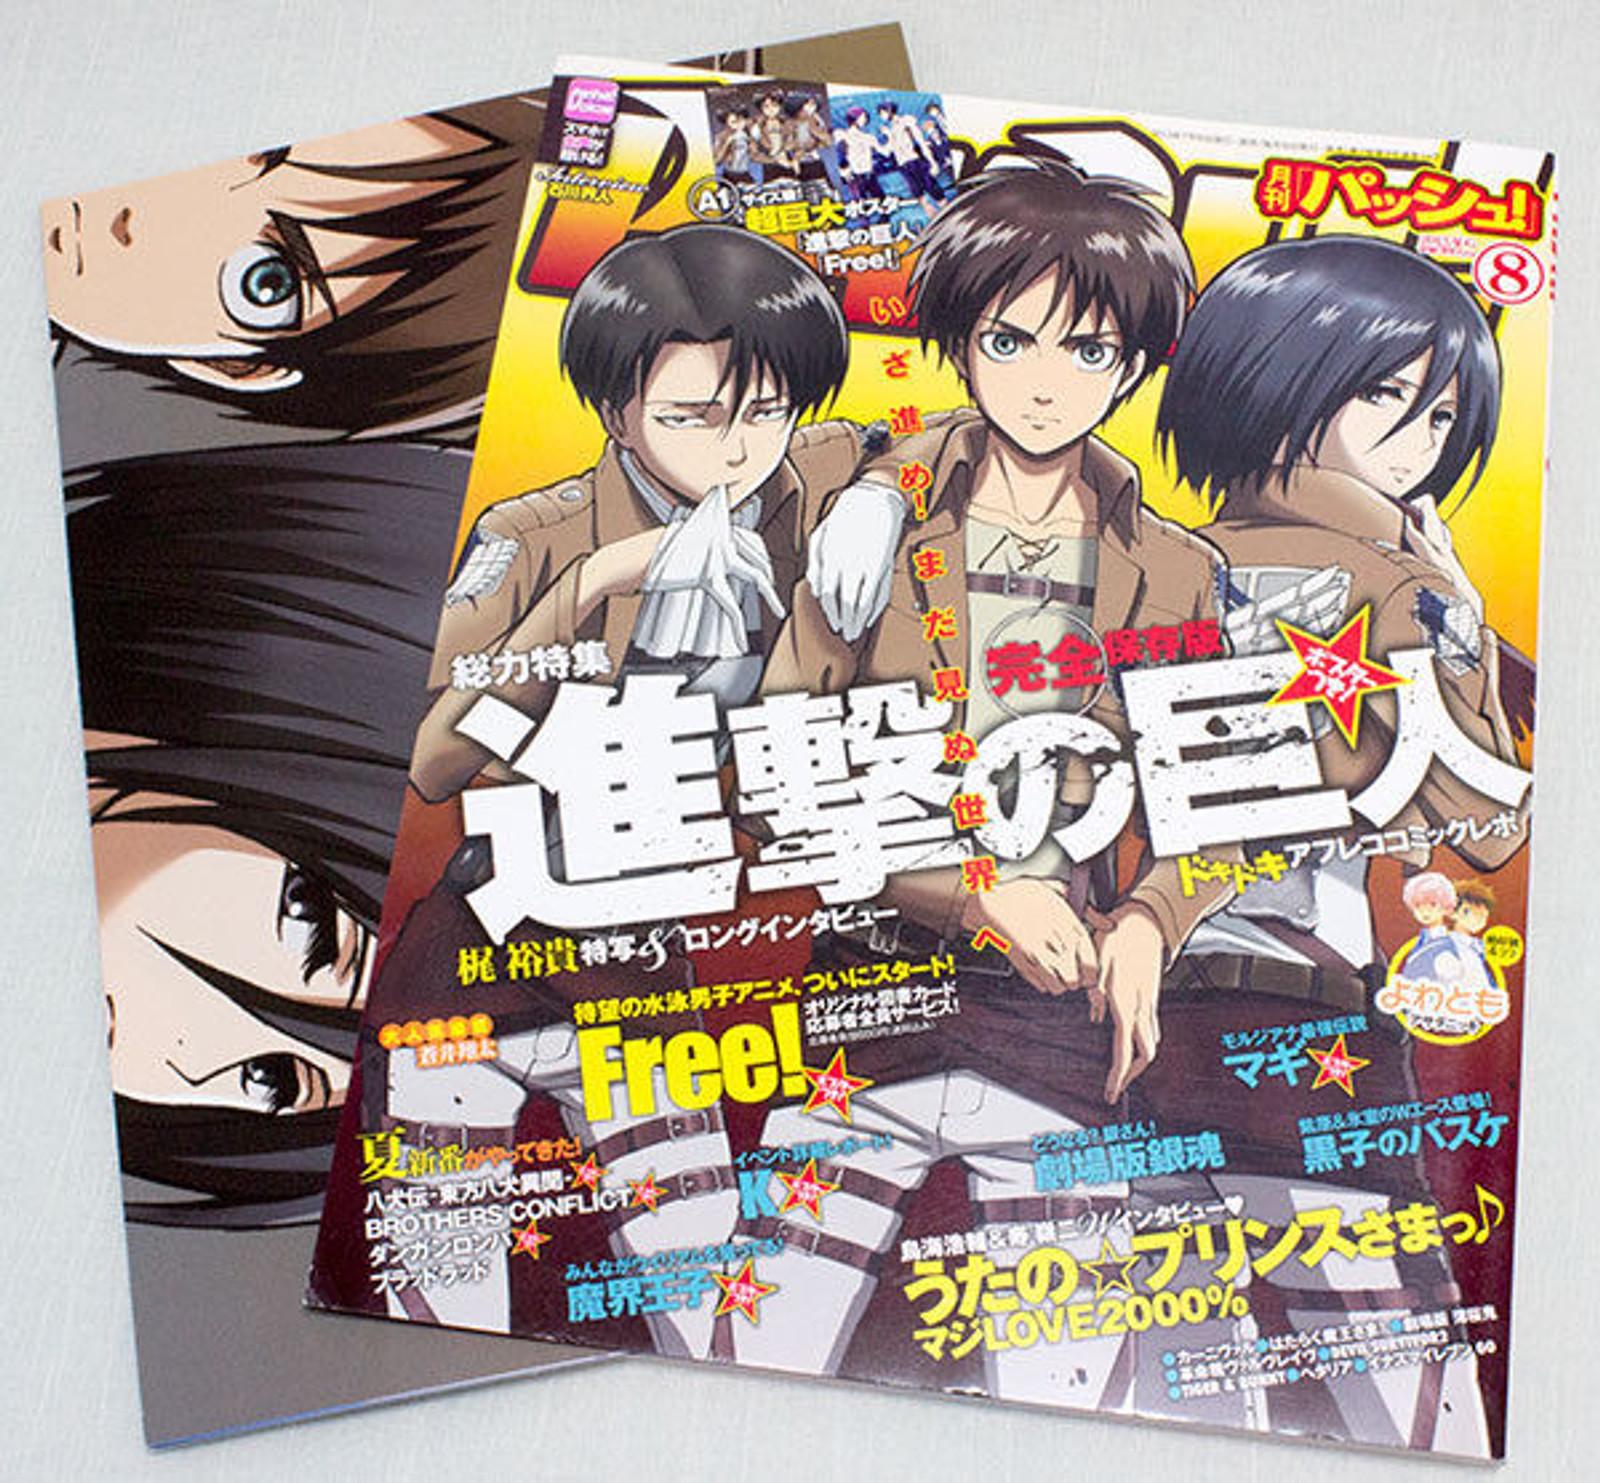 PASH Japan Anime Managzine 08/2013 w/A1 Size Big Poster Free!/Attack on Titans